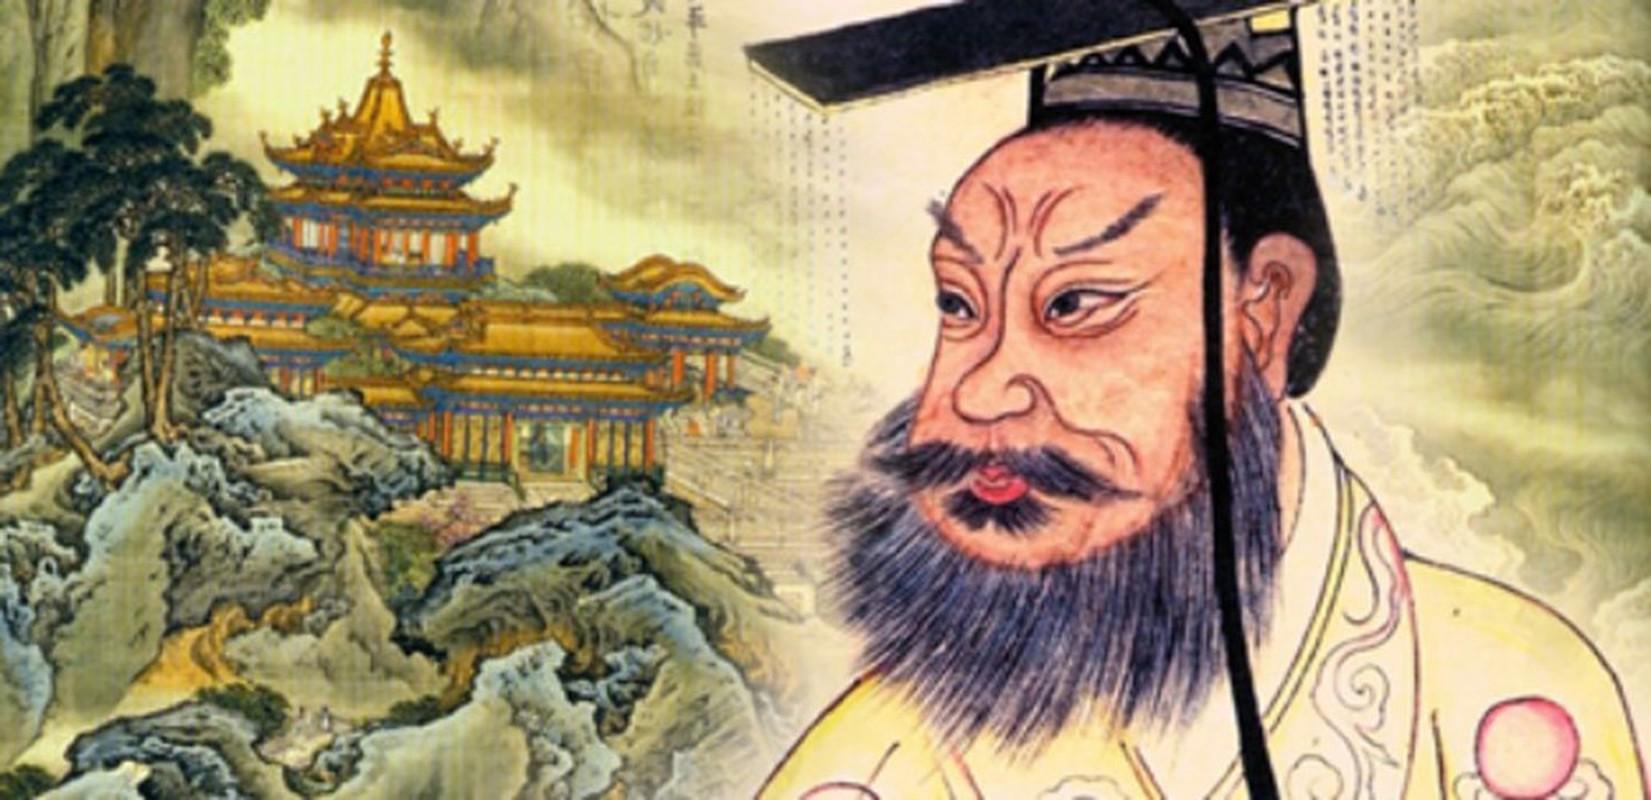 Moi tinh khien Tan Thuy Hoang day dut den chet-Hinh-10